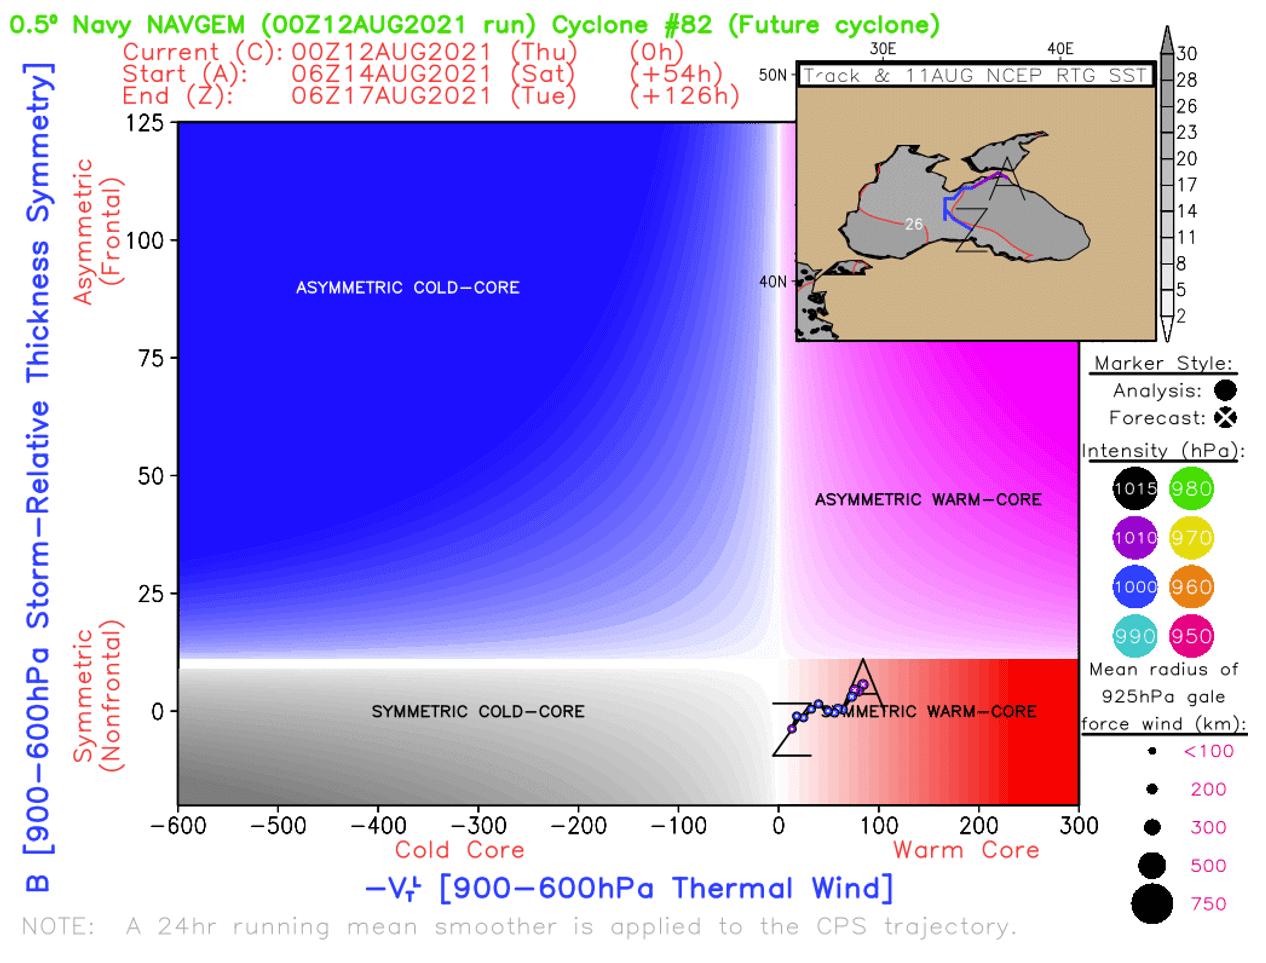 tropical-like-cyclone-medicane-alike-black-sea-impact-warm-core